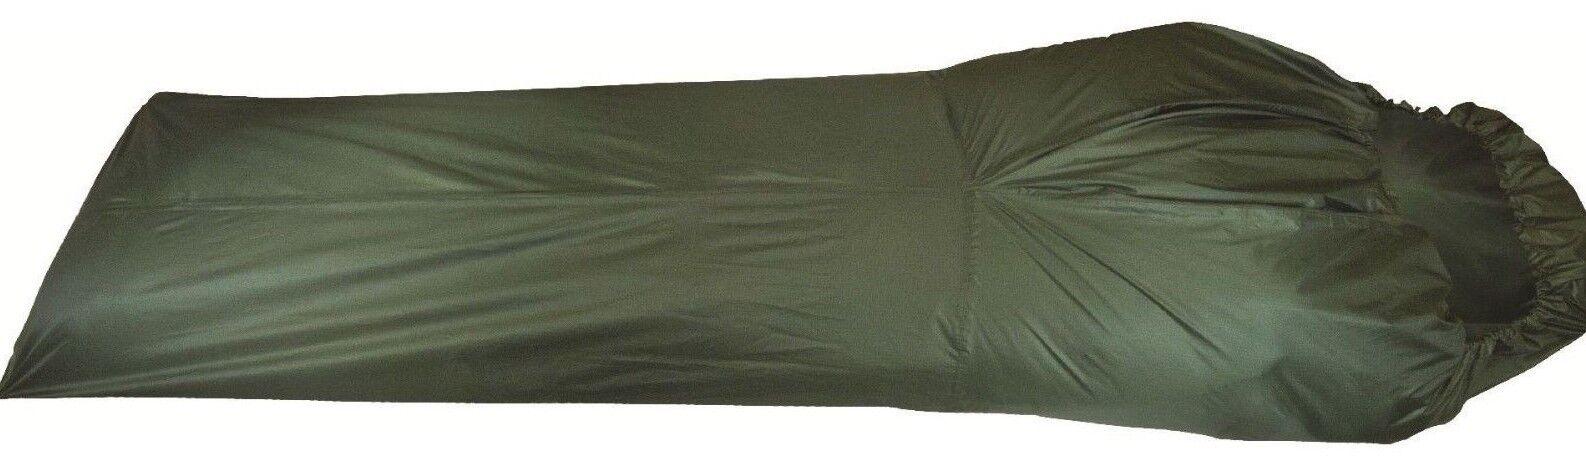 Bivvi Shelter Highlander KESTREL BIVI BAG Waterproof Lightweight Camping Sleep